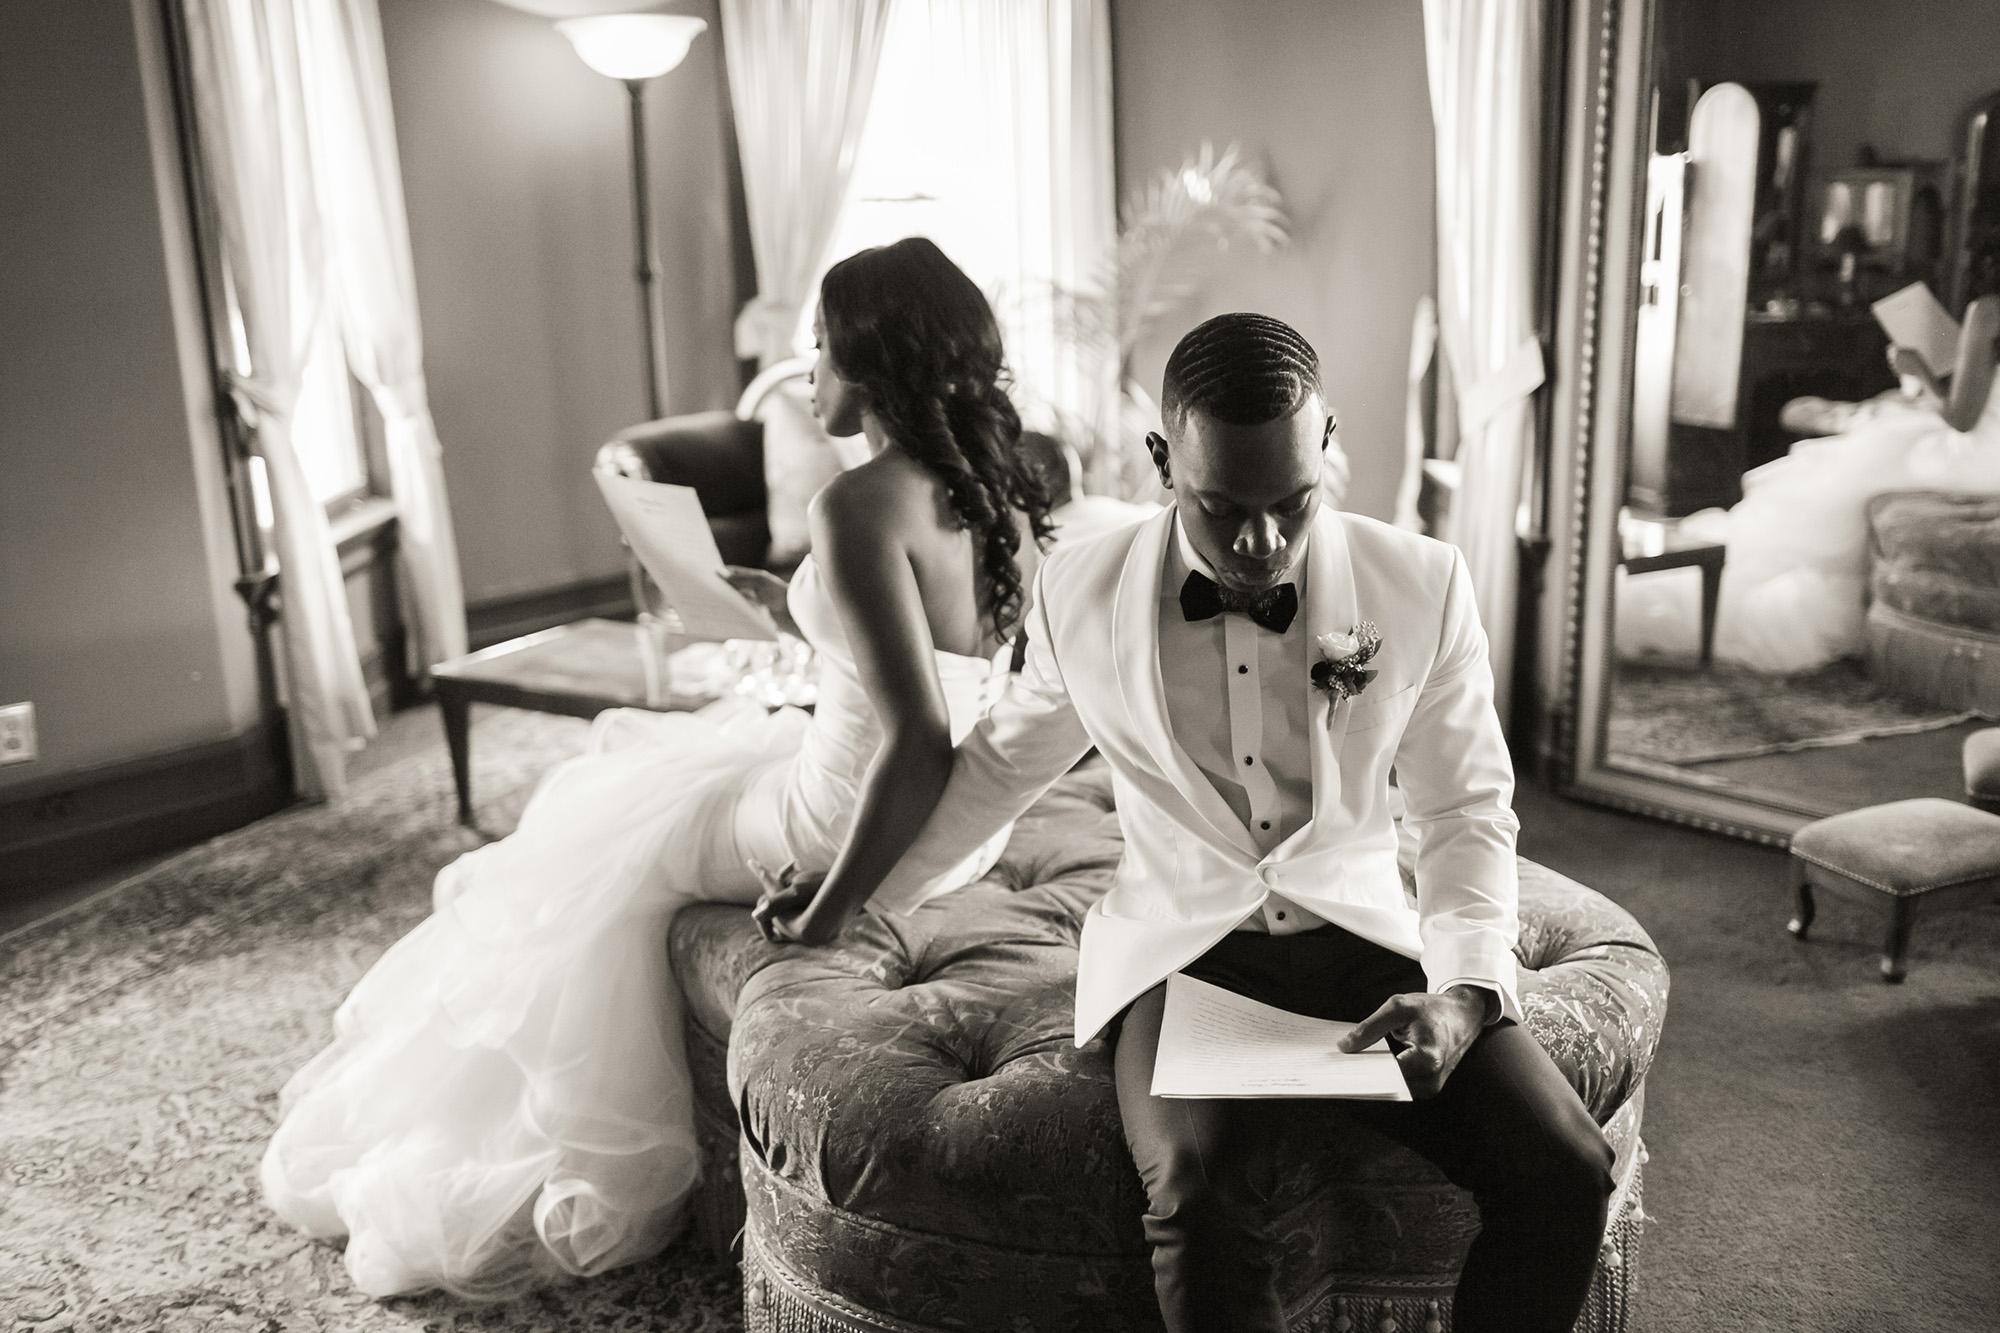 associate-photographer-christmas-house-wedding-carrie-vines-0058.jpg